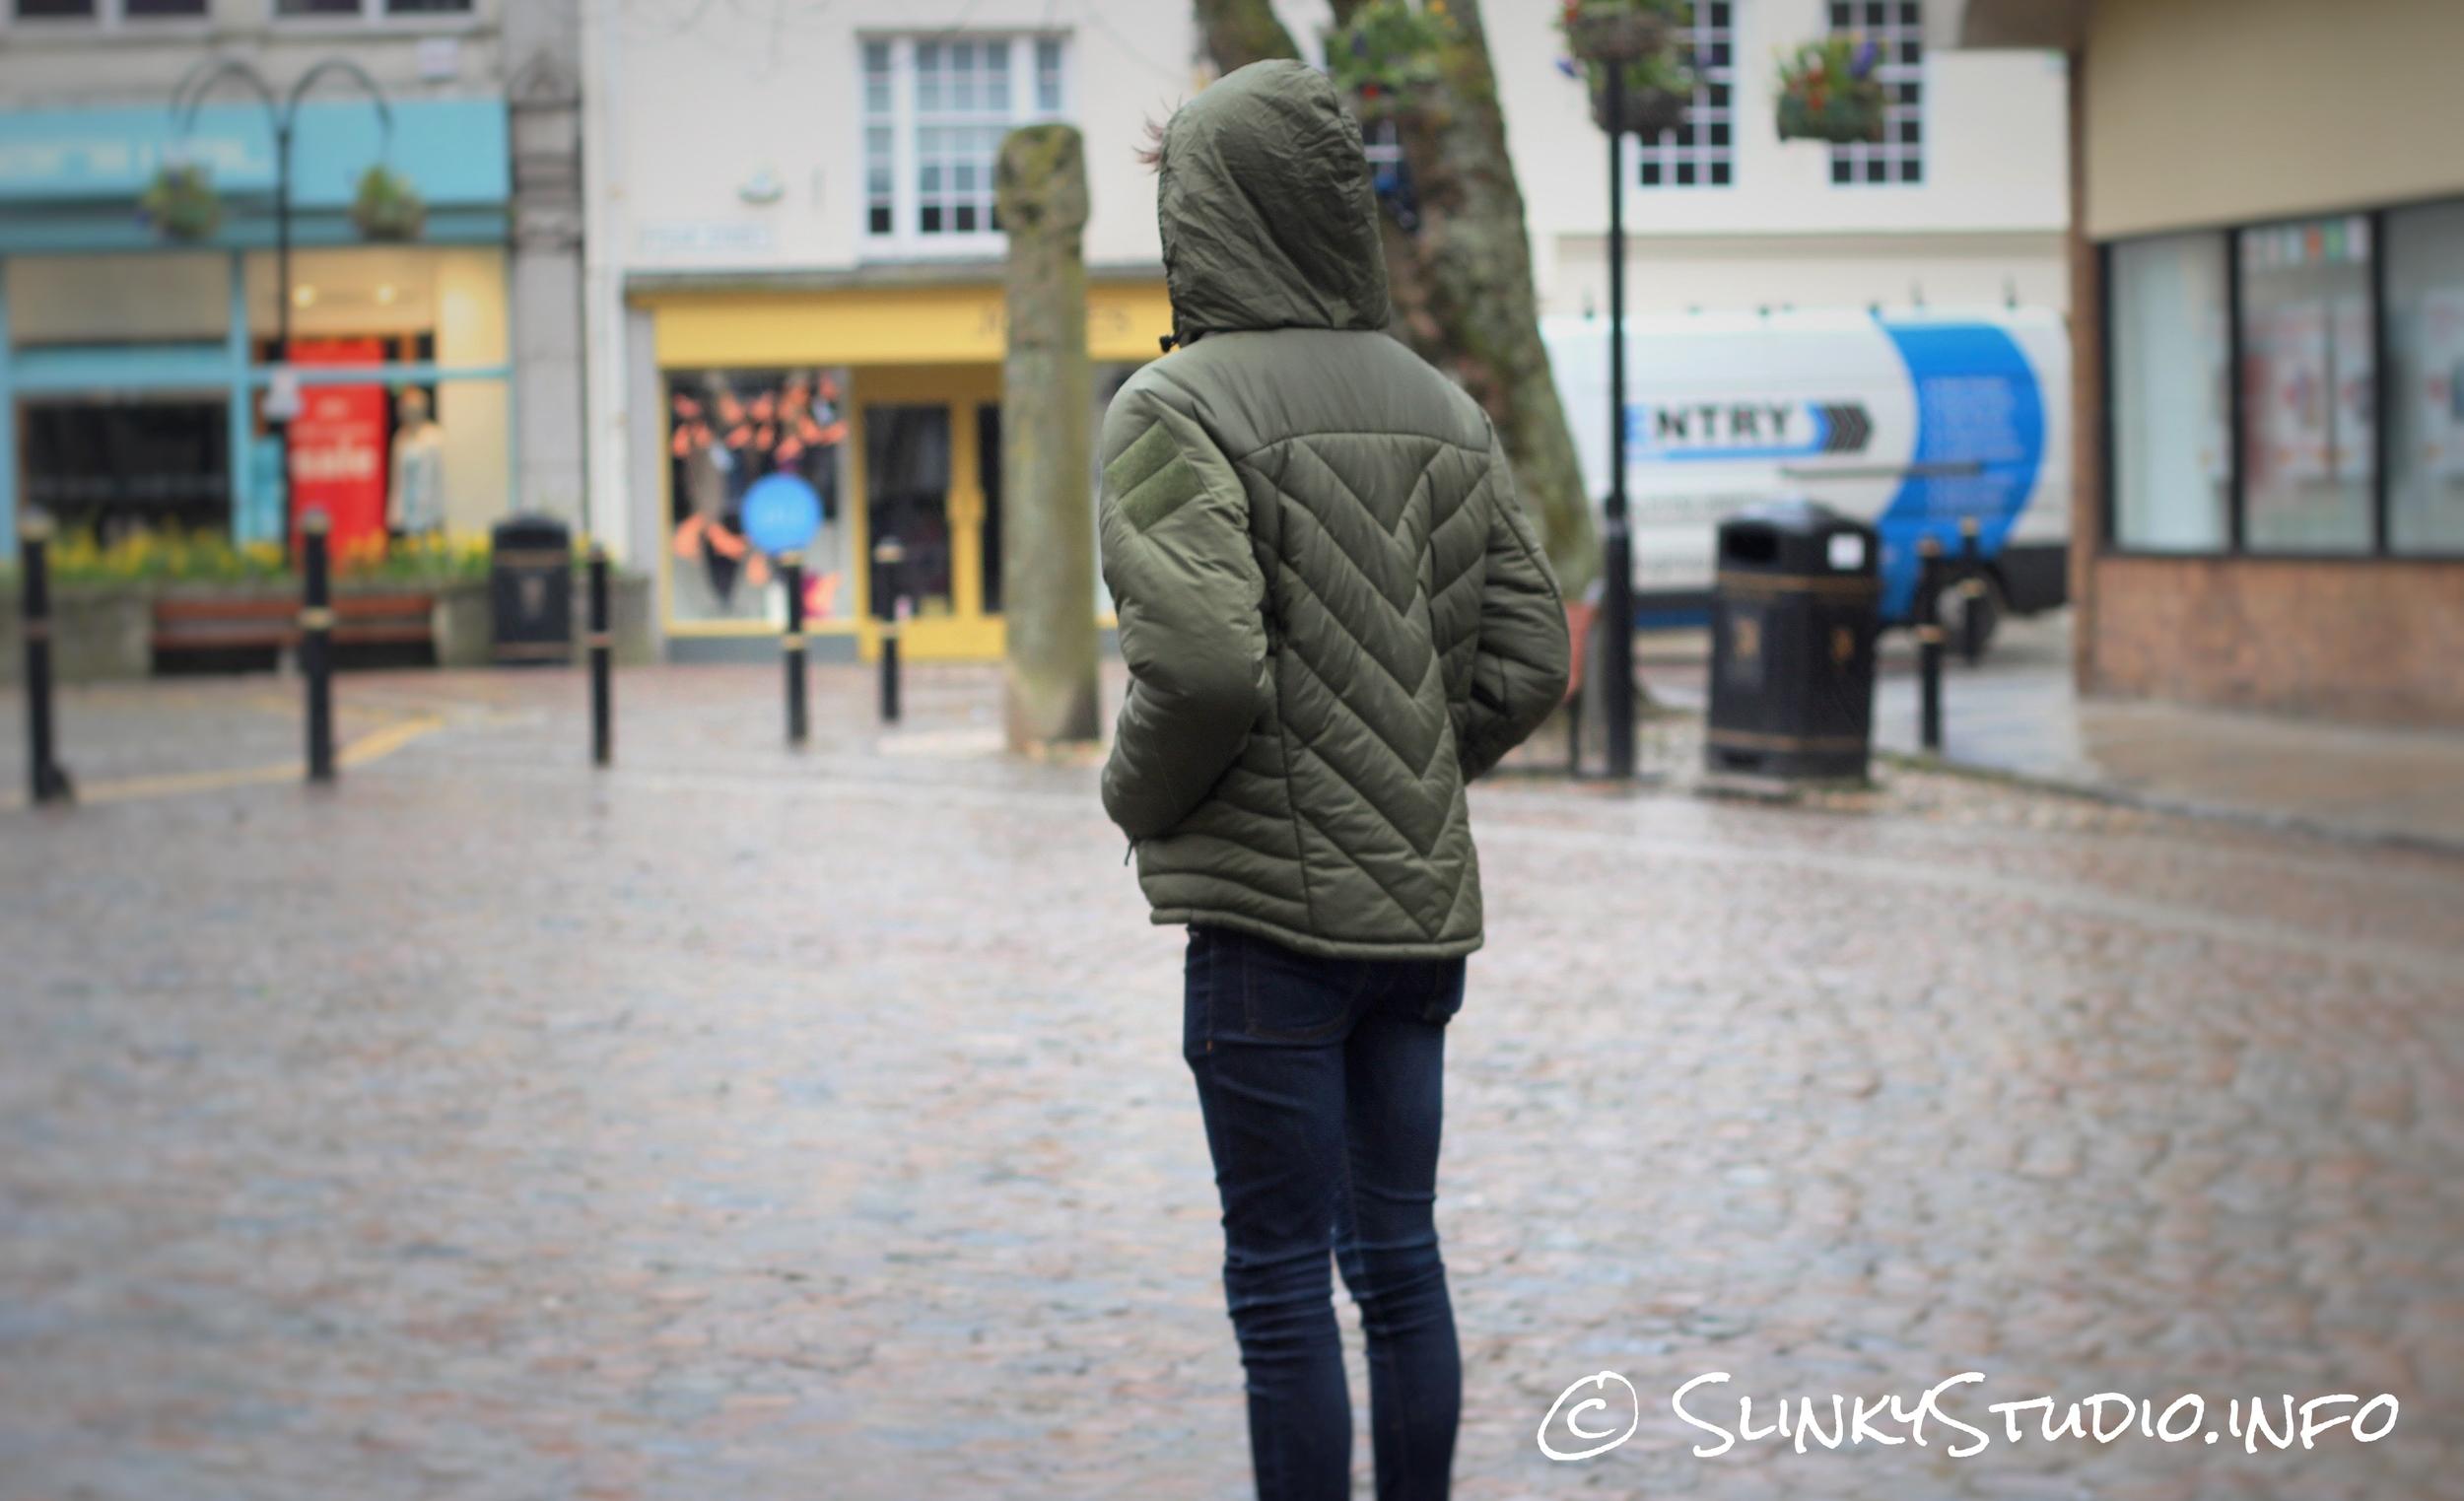 Snugpak SJ6 Jacket Hood Up Full Body Truro City Cornwall.jpg